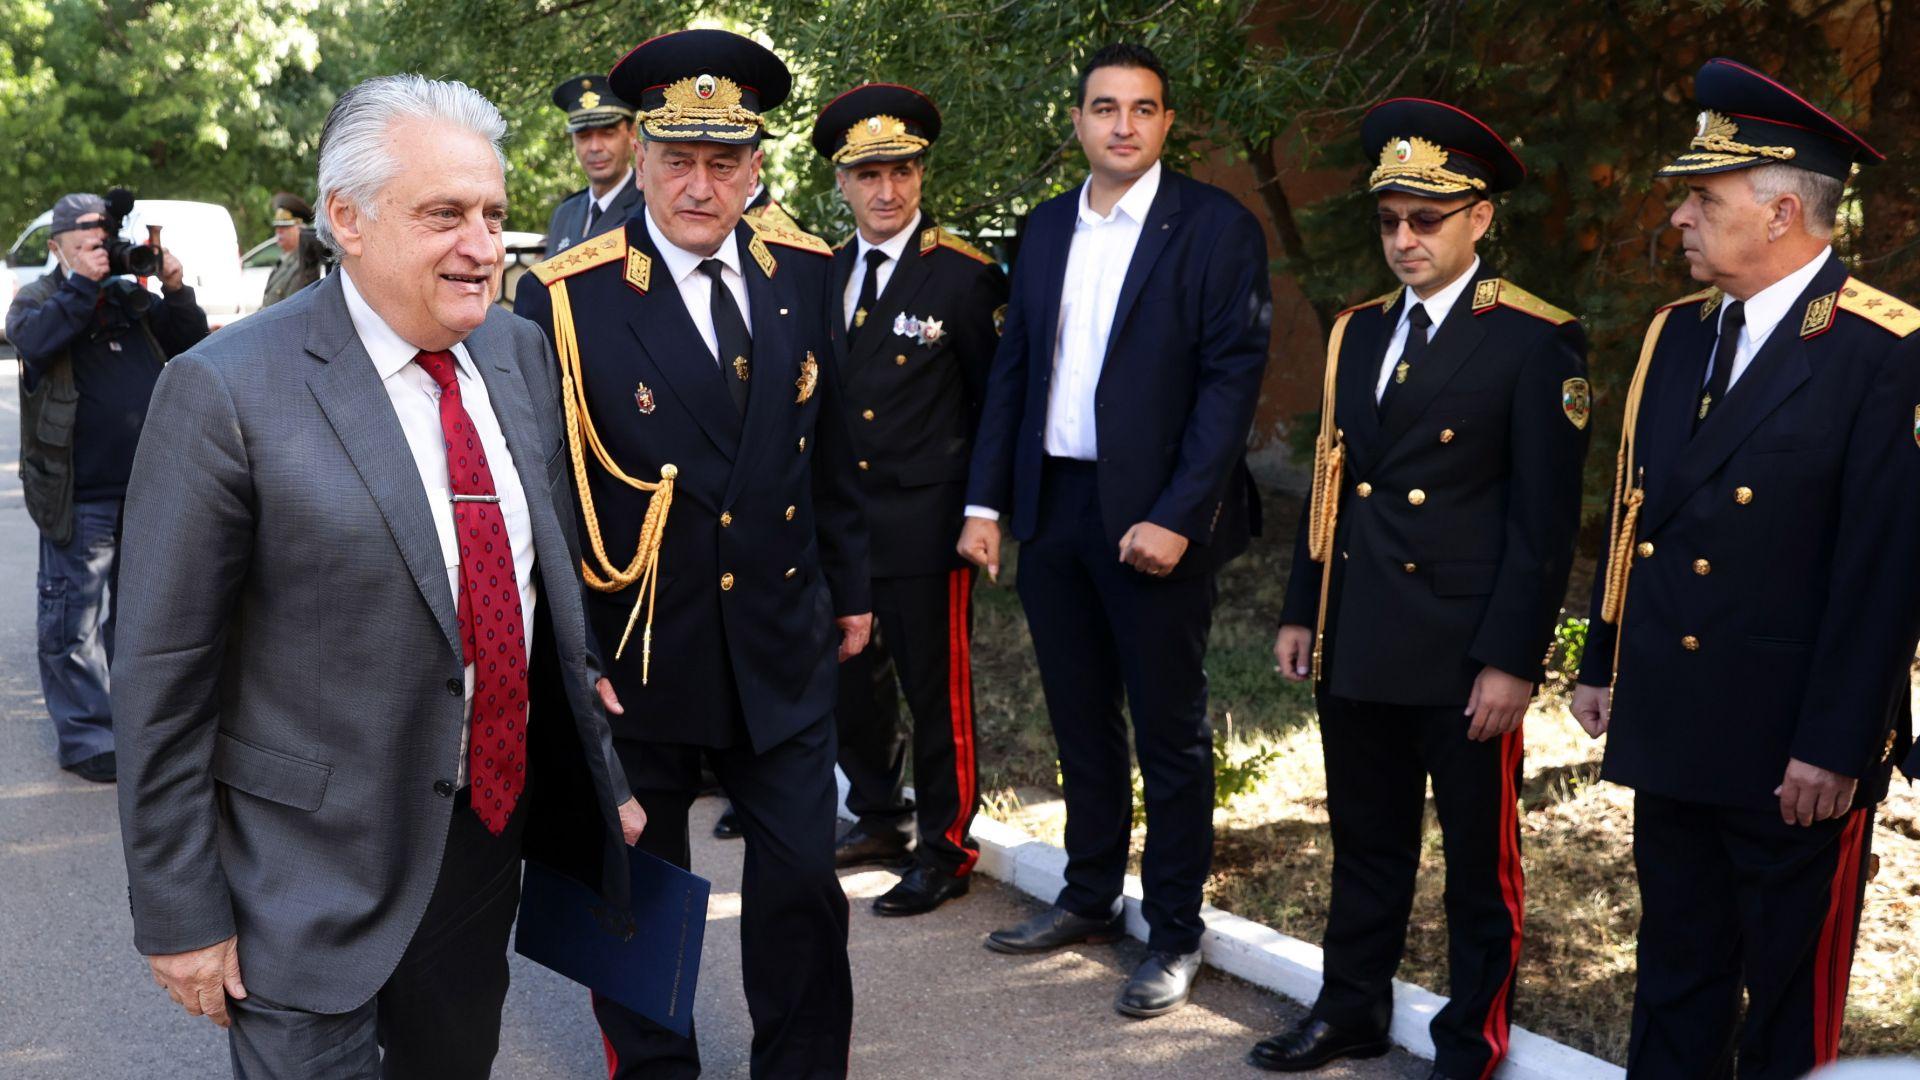 Бойко Рашков засега няма покана да оглави МВР в новия кабинет